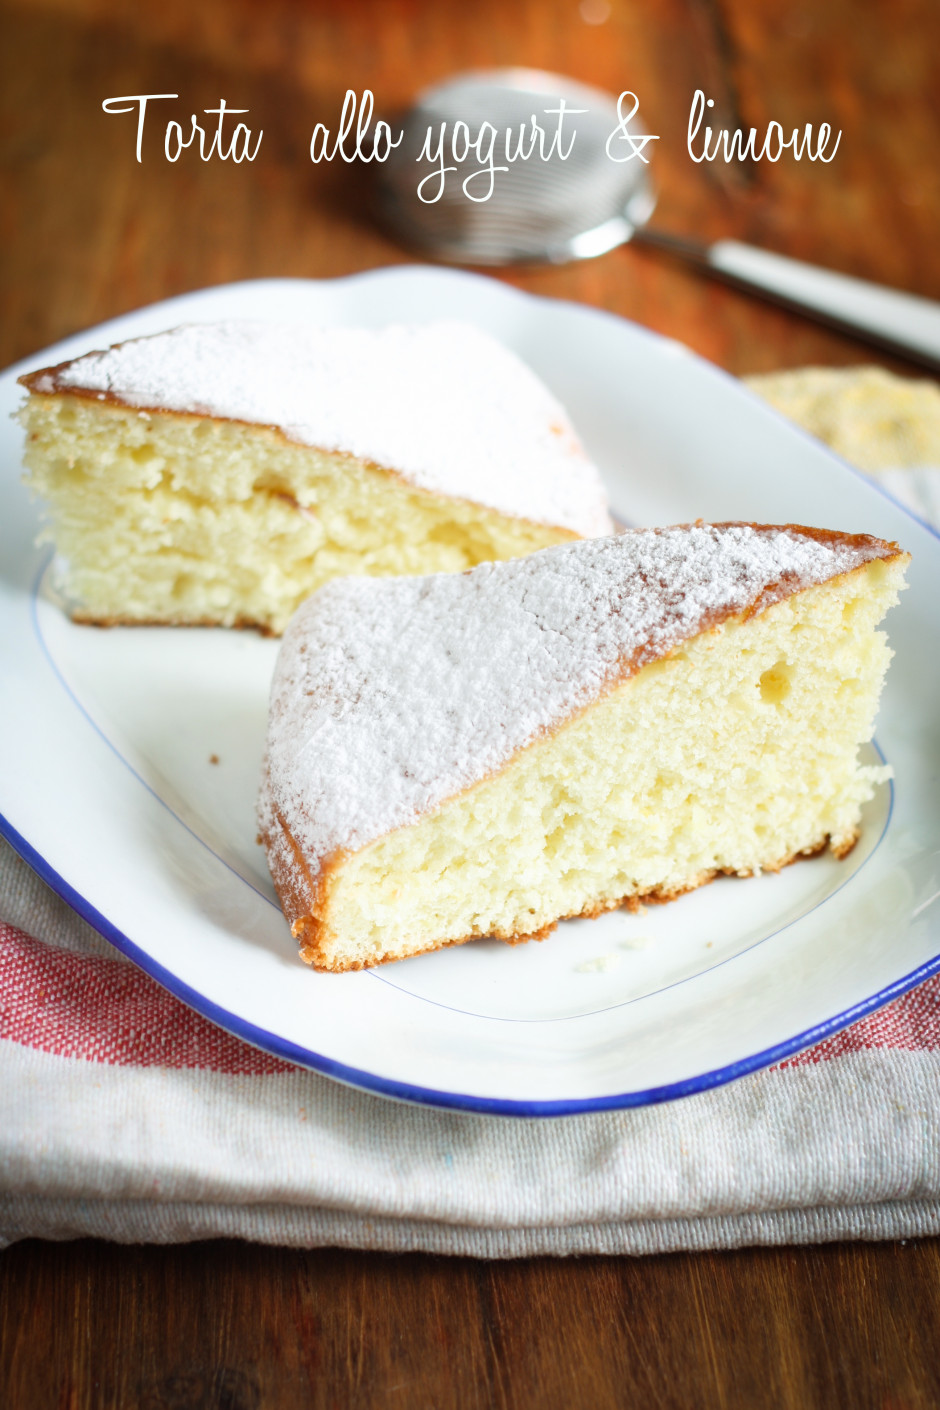 torta allo yogurt e limone